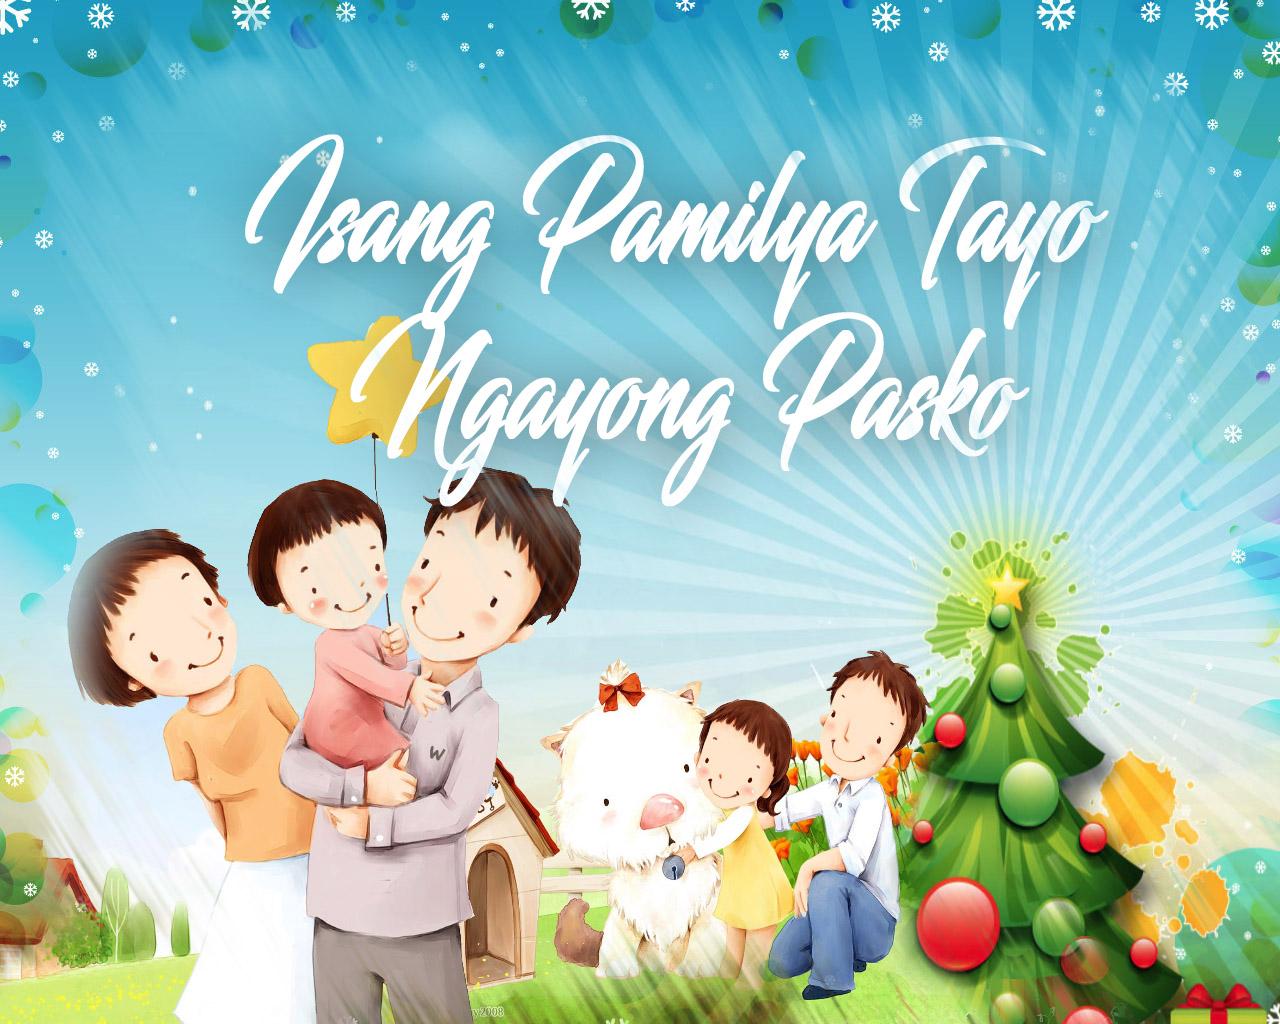 Isang Pamilya Tayo Ngayong Pasko Family Bonding Together